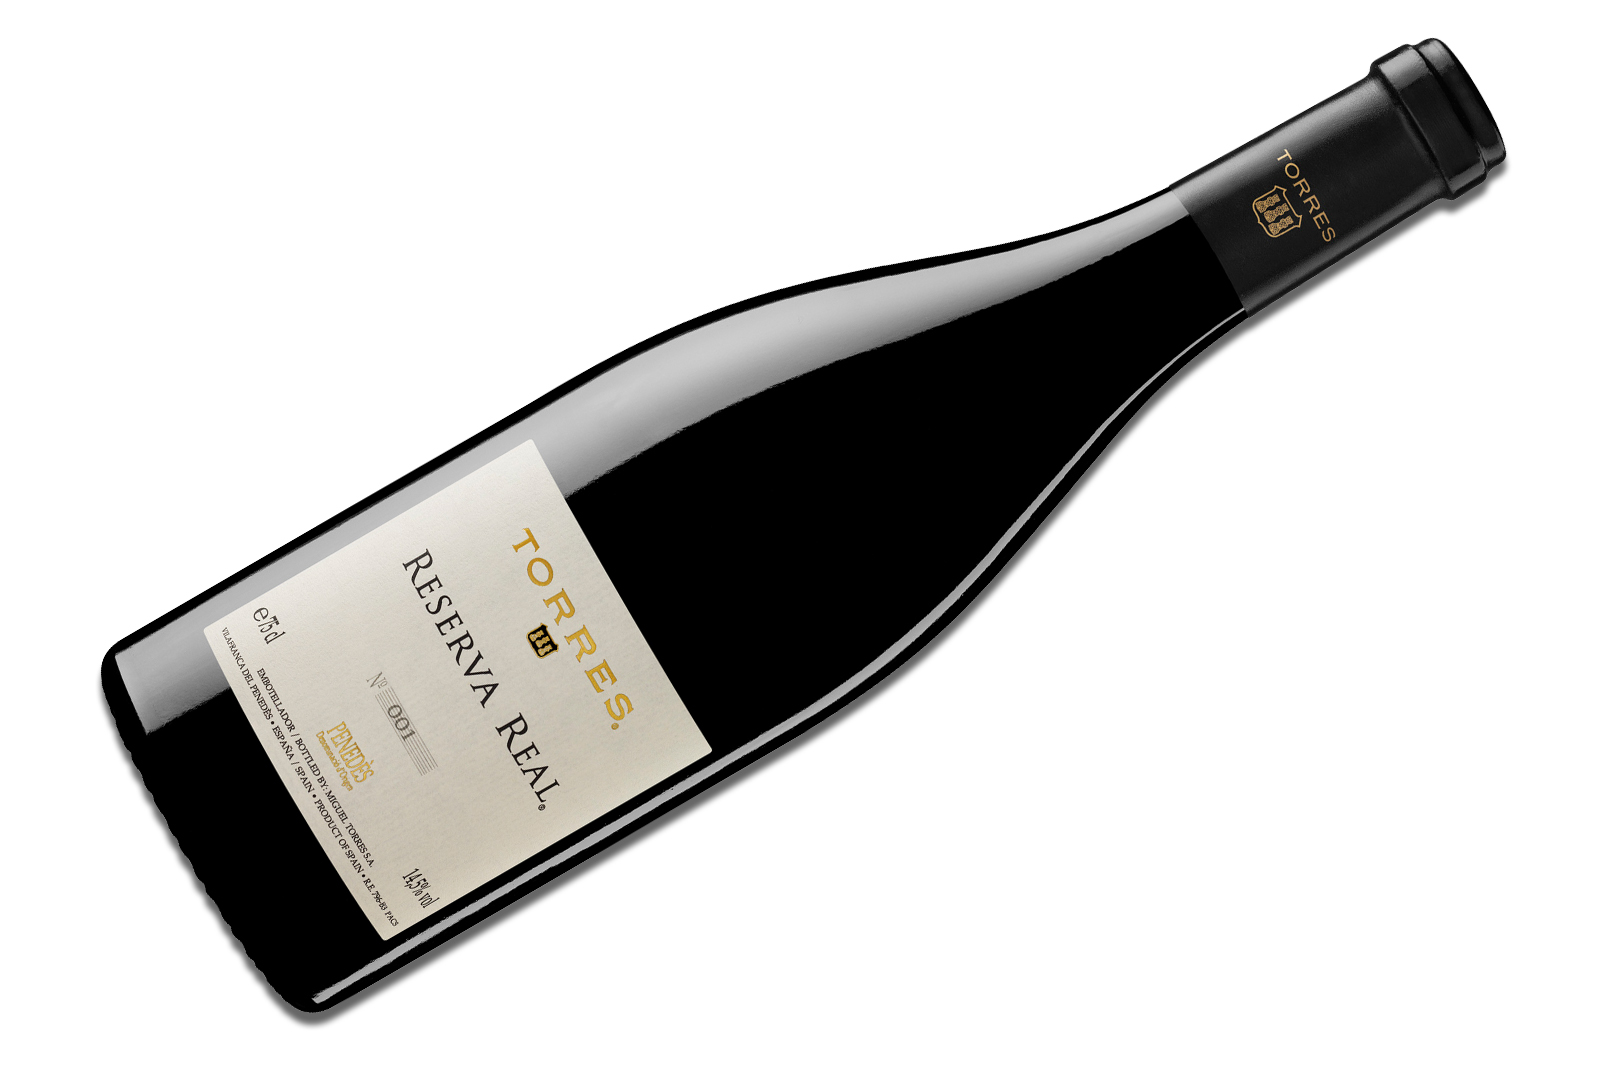 Reserva Real de Bodegas Torres, mejor vino de uvas bordelesas